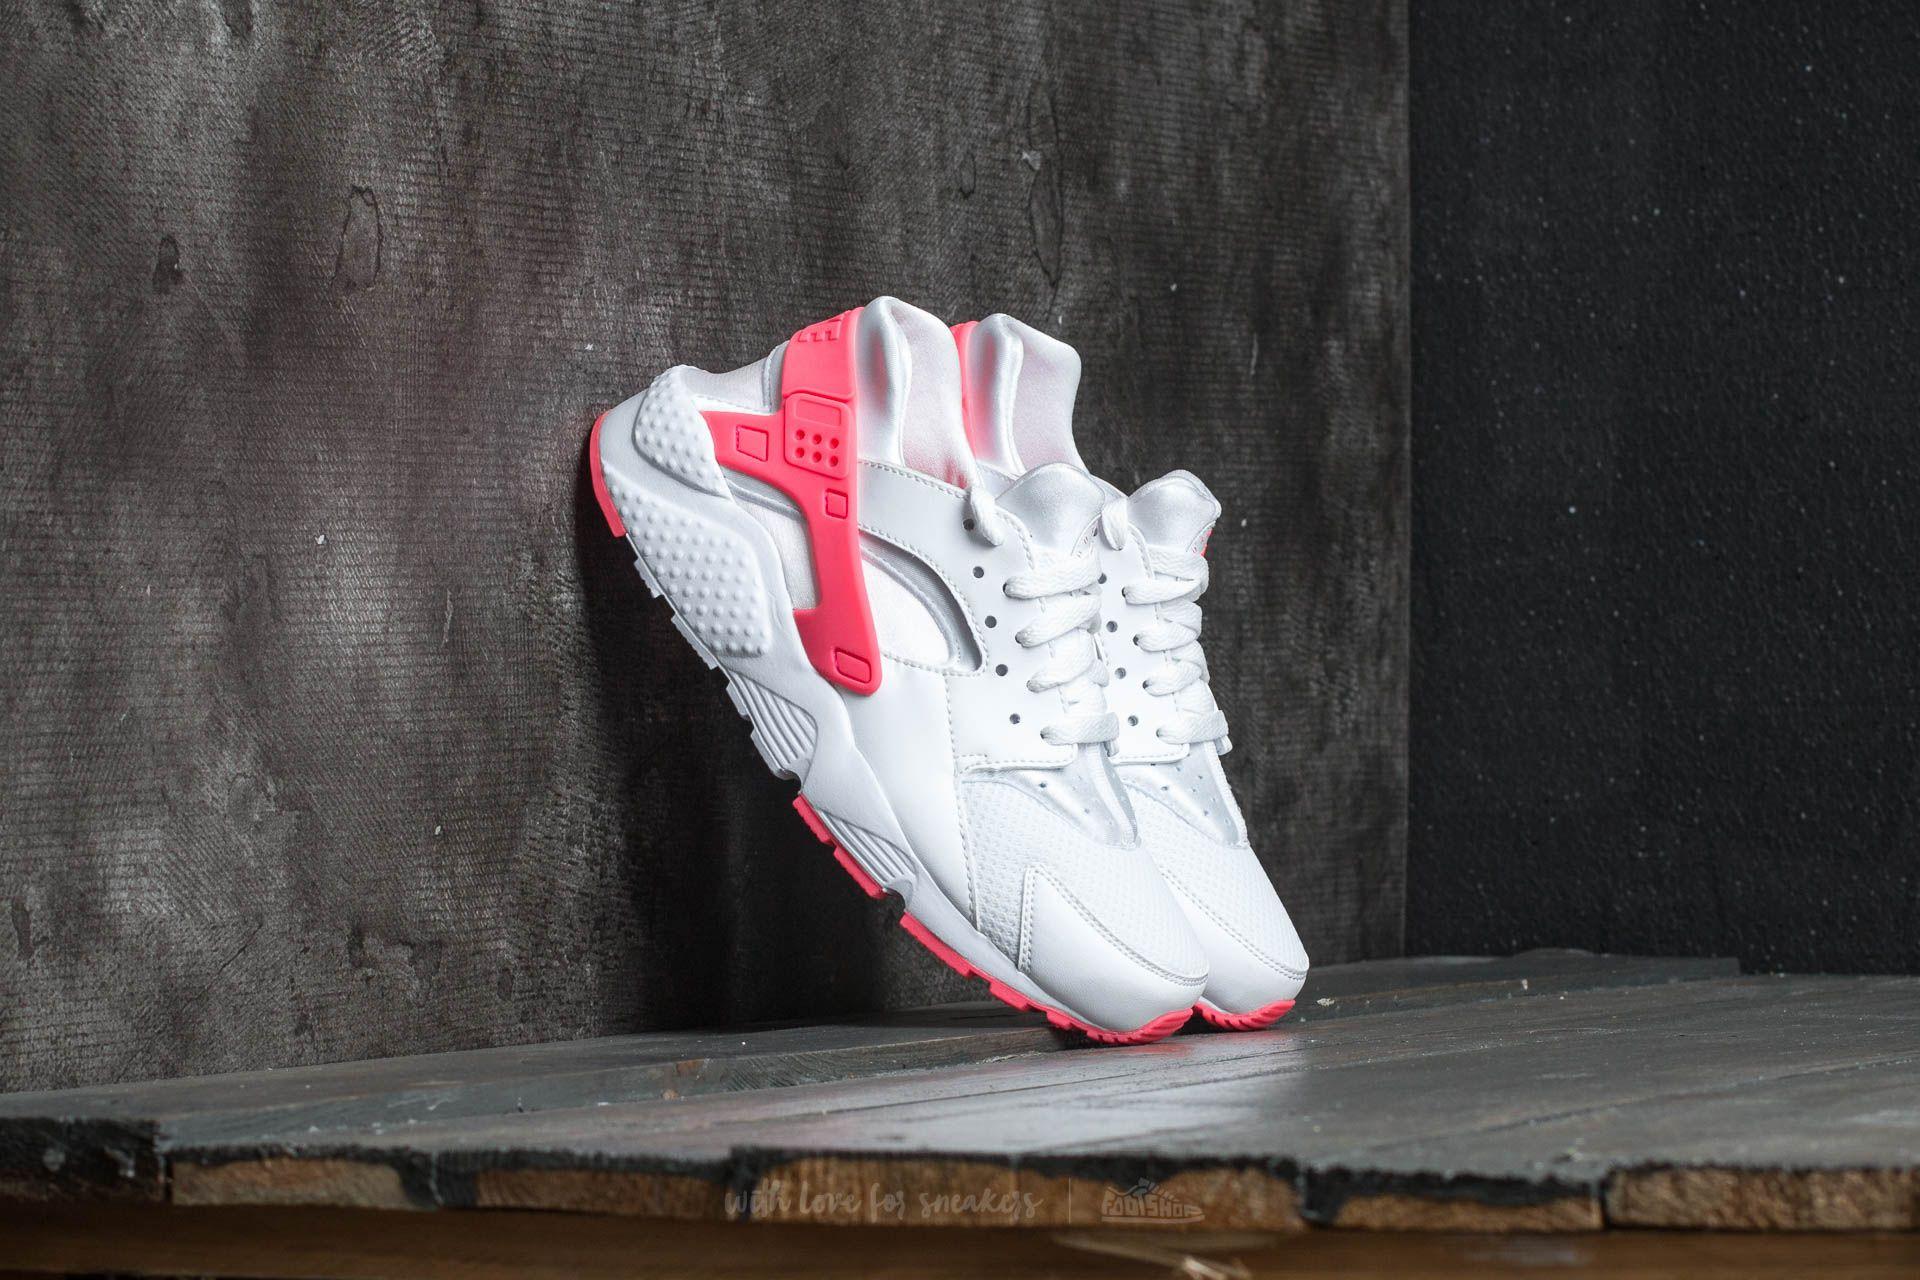 64426d4fc181 Nike Huarache Run (GS) White  Racer Pink